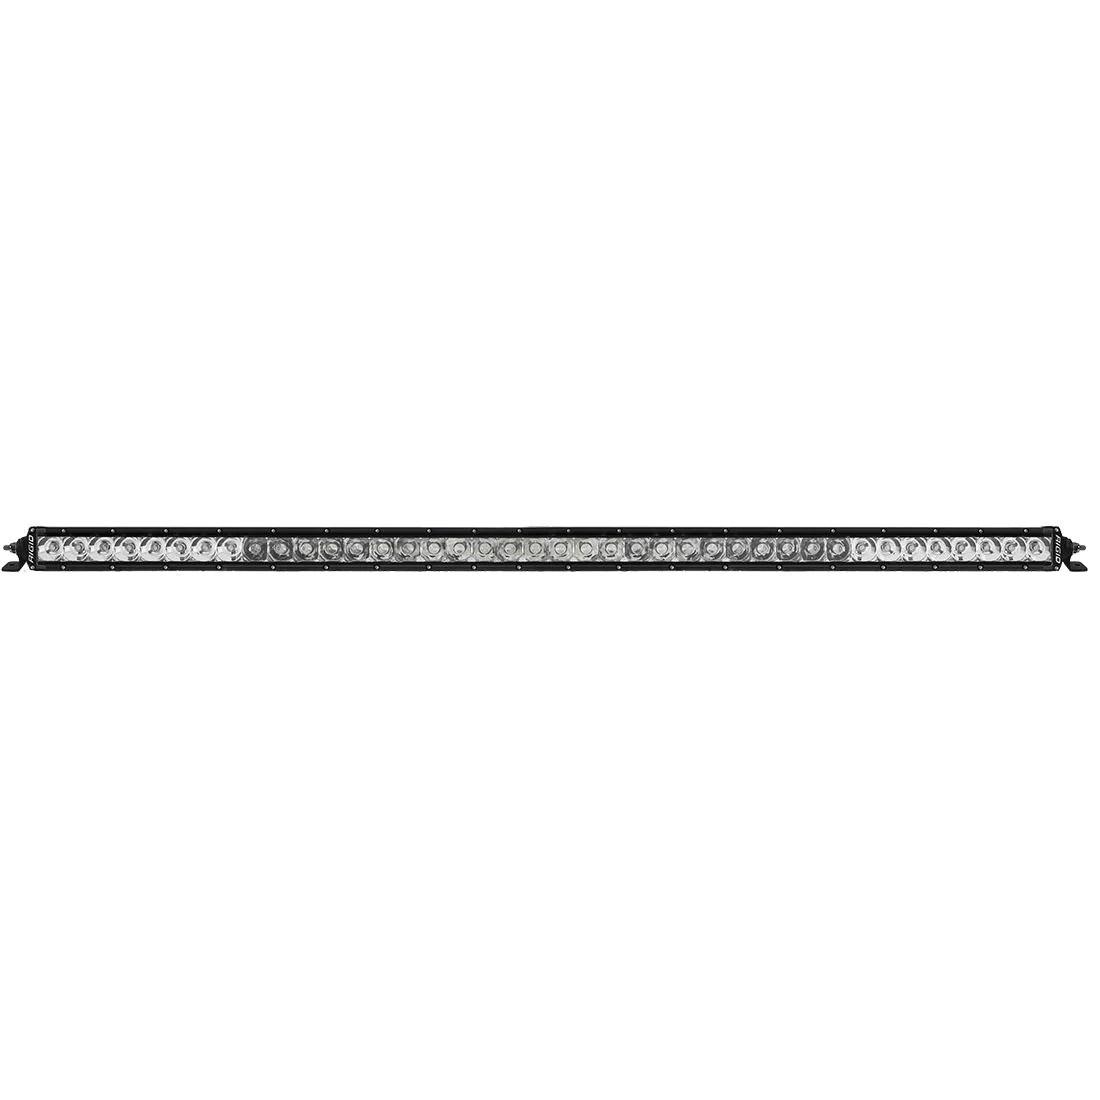 hight resolution of rigid industries sr series 40 led spot flood combo light bar main line overland